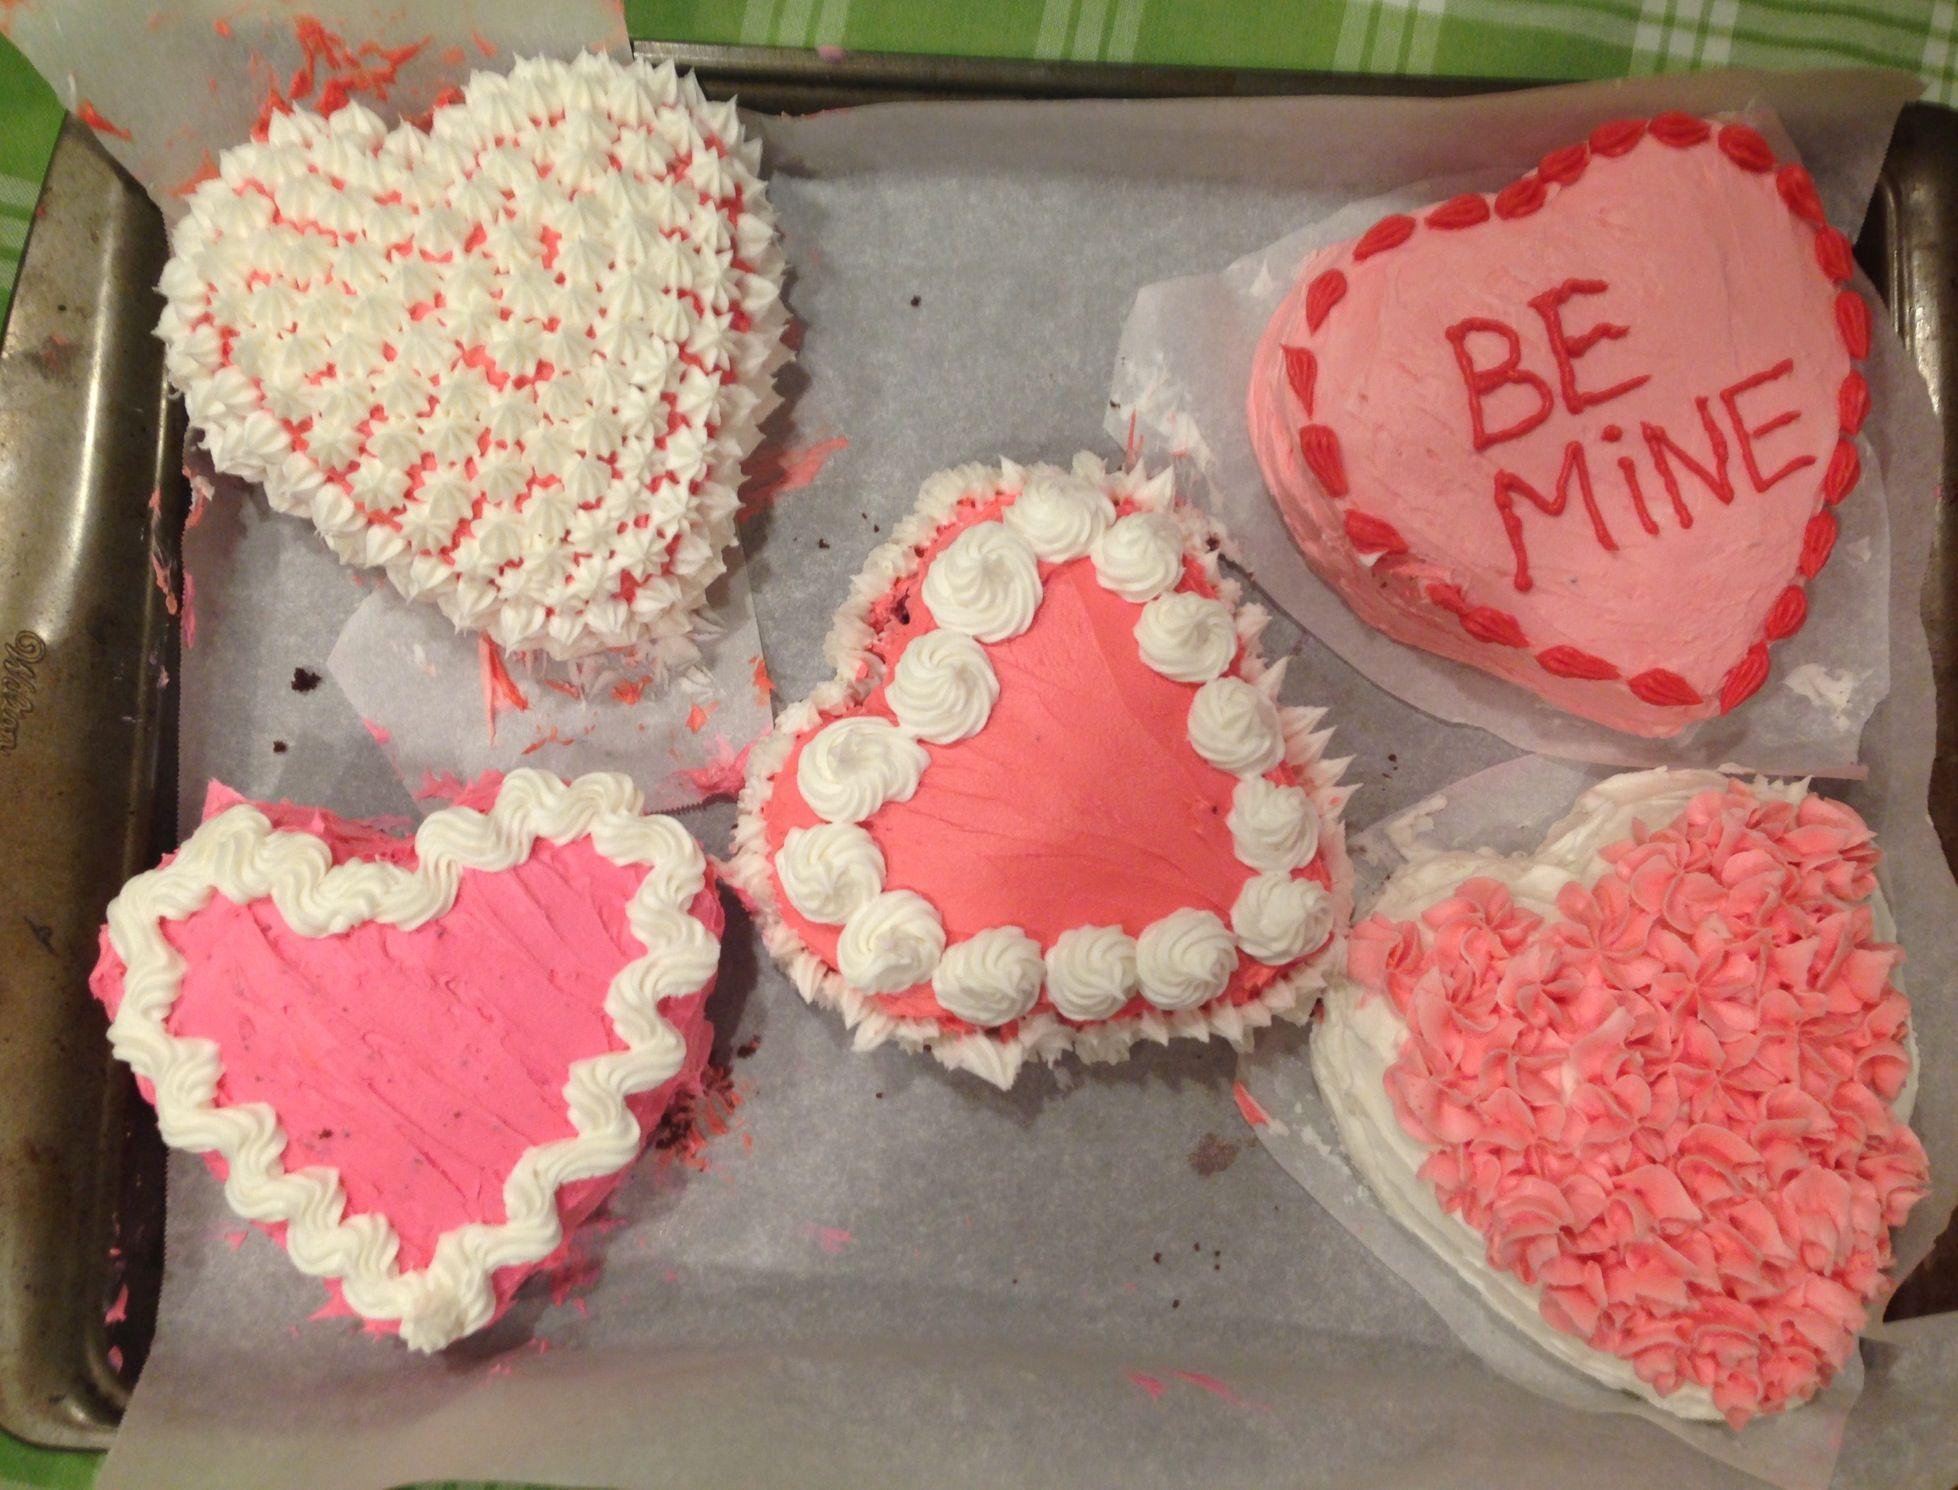 Valentine's Day Cakes 2014 #valentinesday #valentinesdaycake #heartcake #pink #pinkcake #bake #bemine